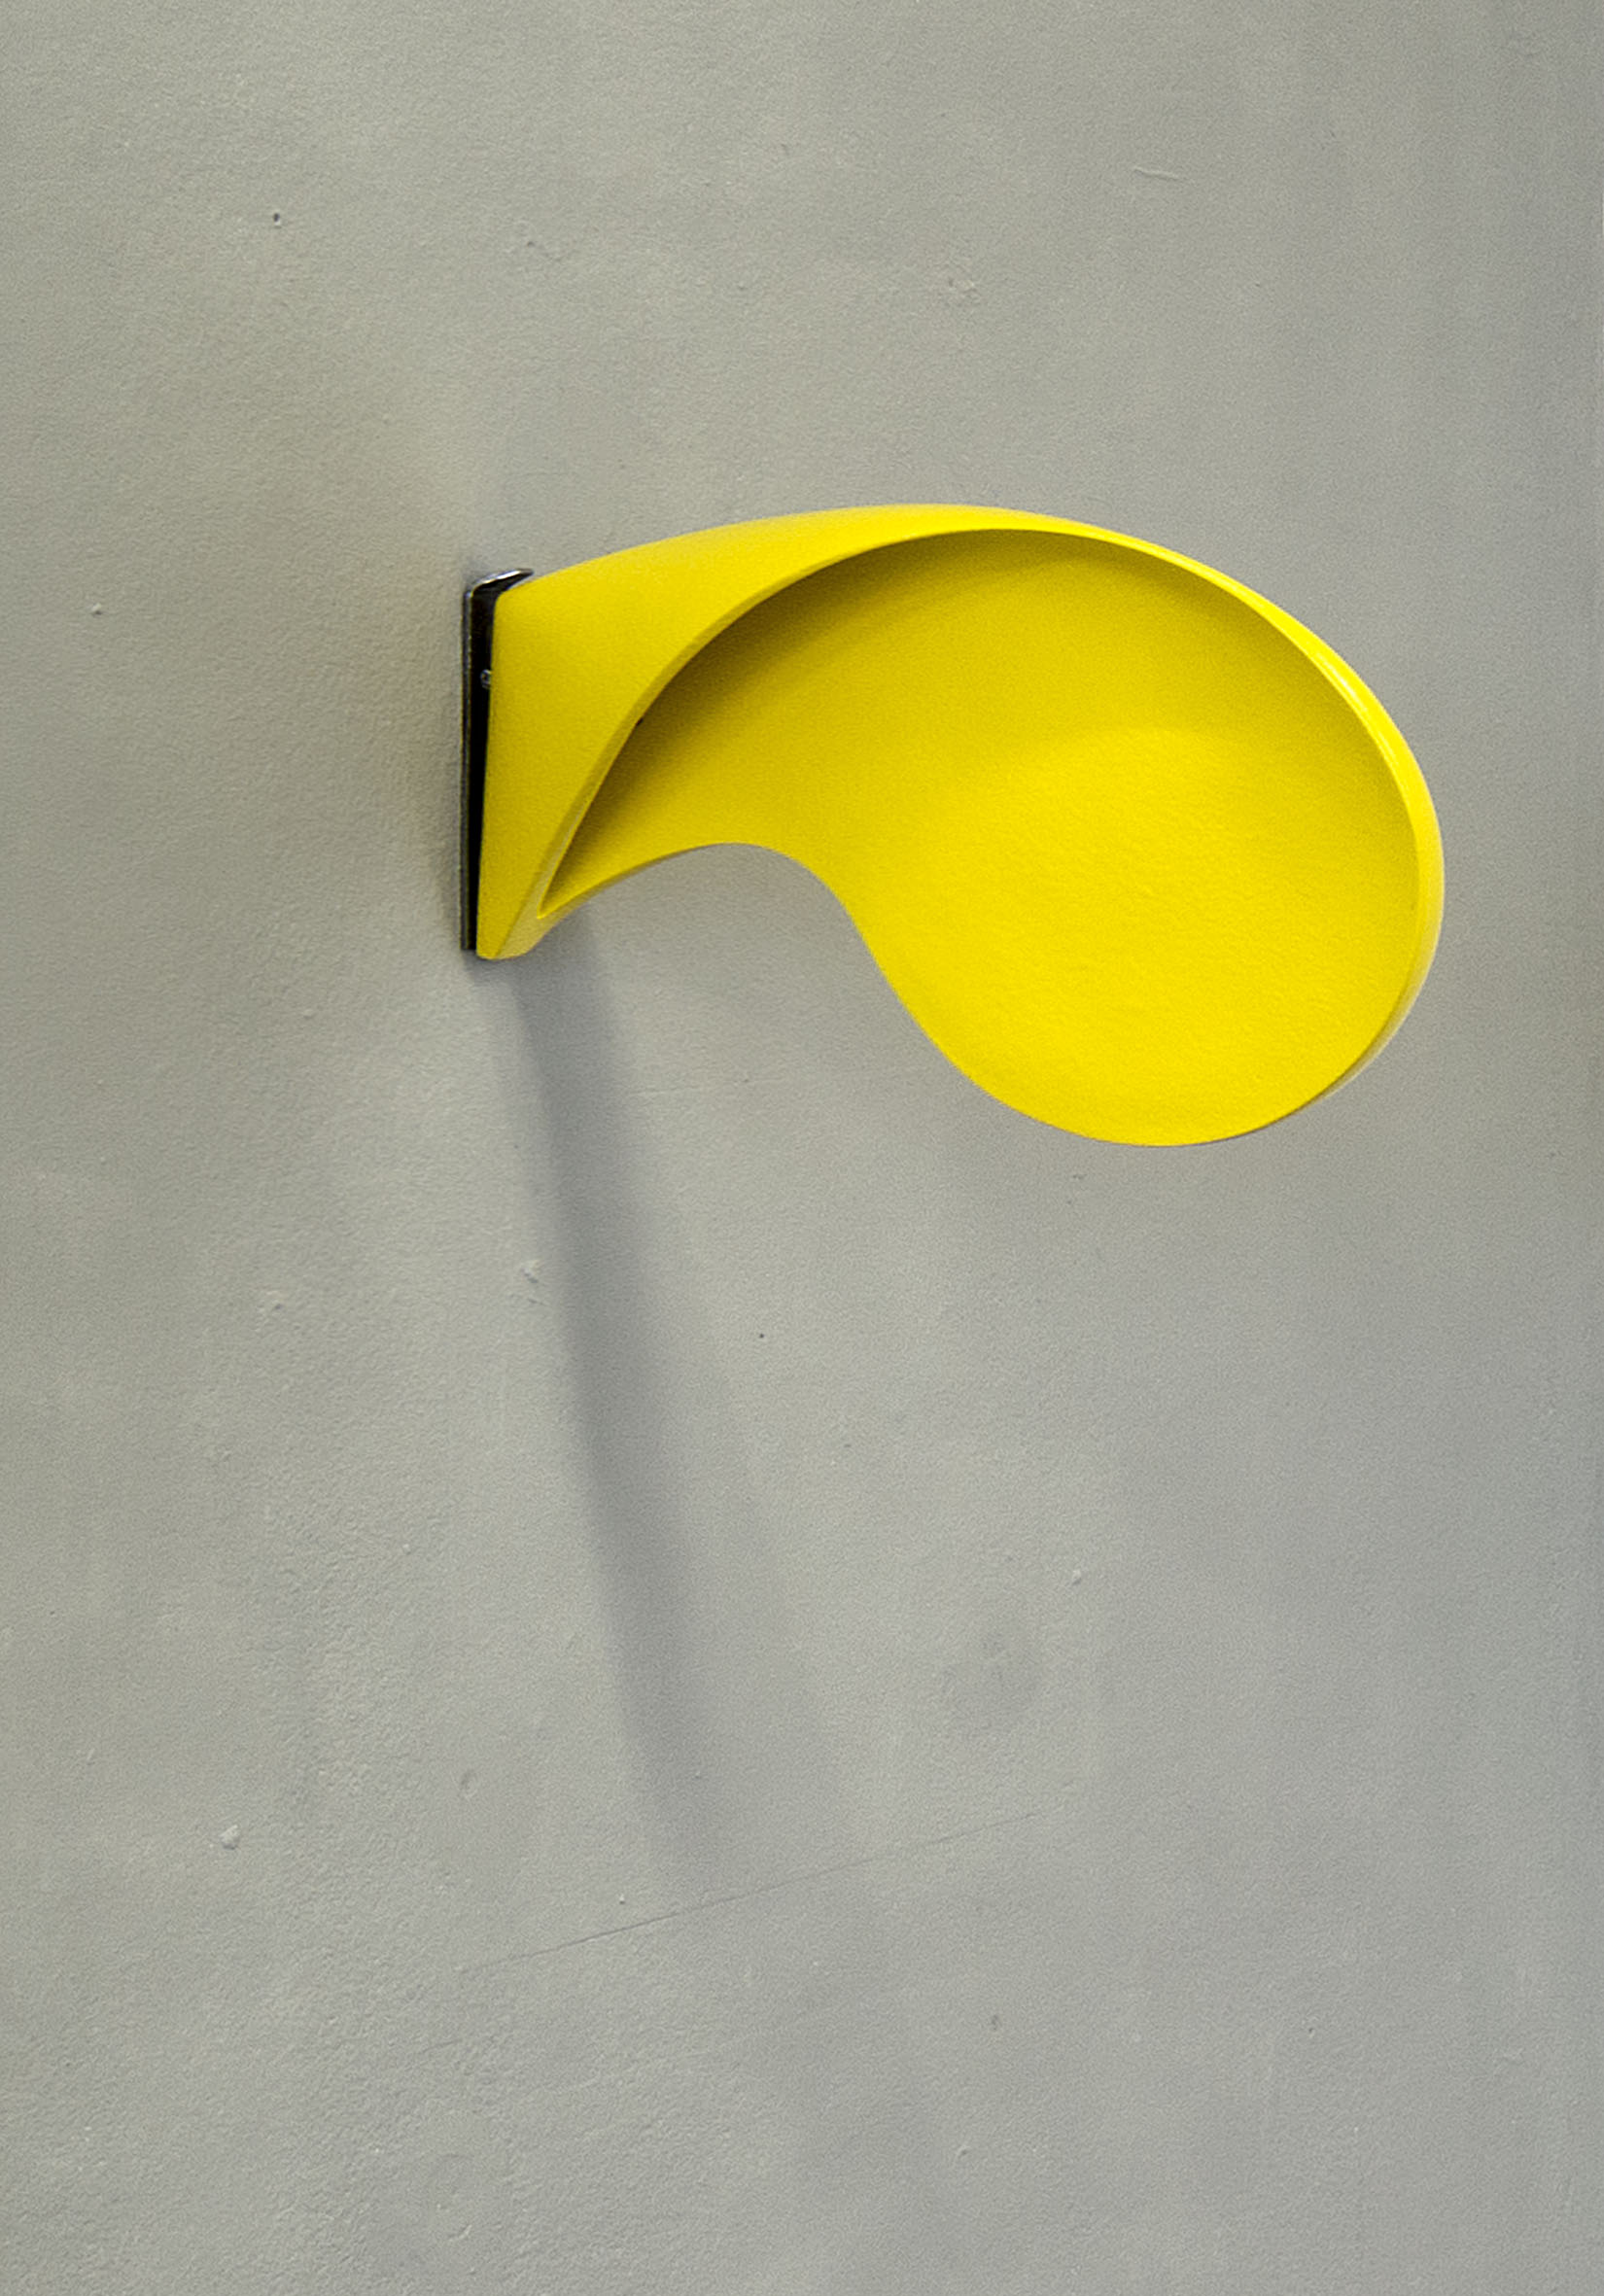 Bild Nr. 6 Lackierte Keramik u. Metall